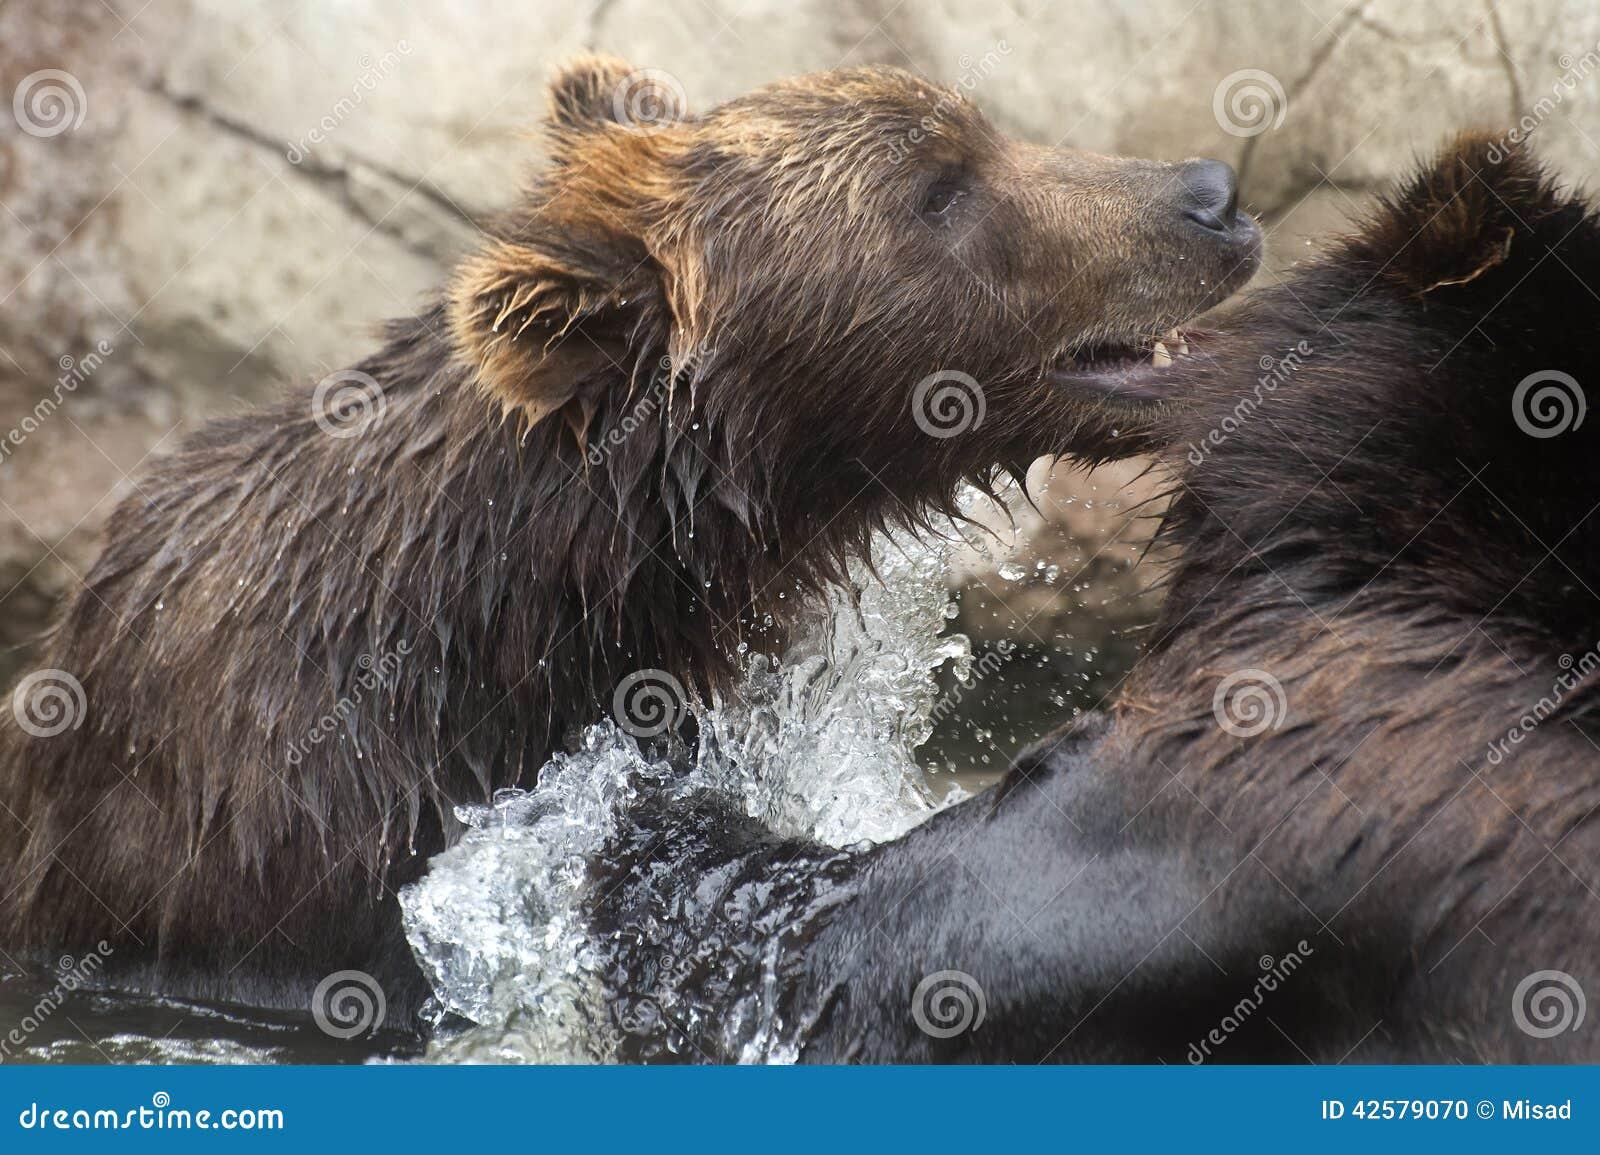 Siberian Brown Bears